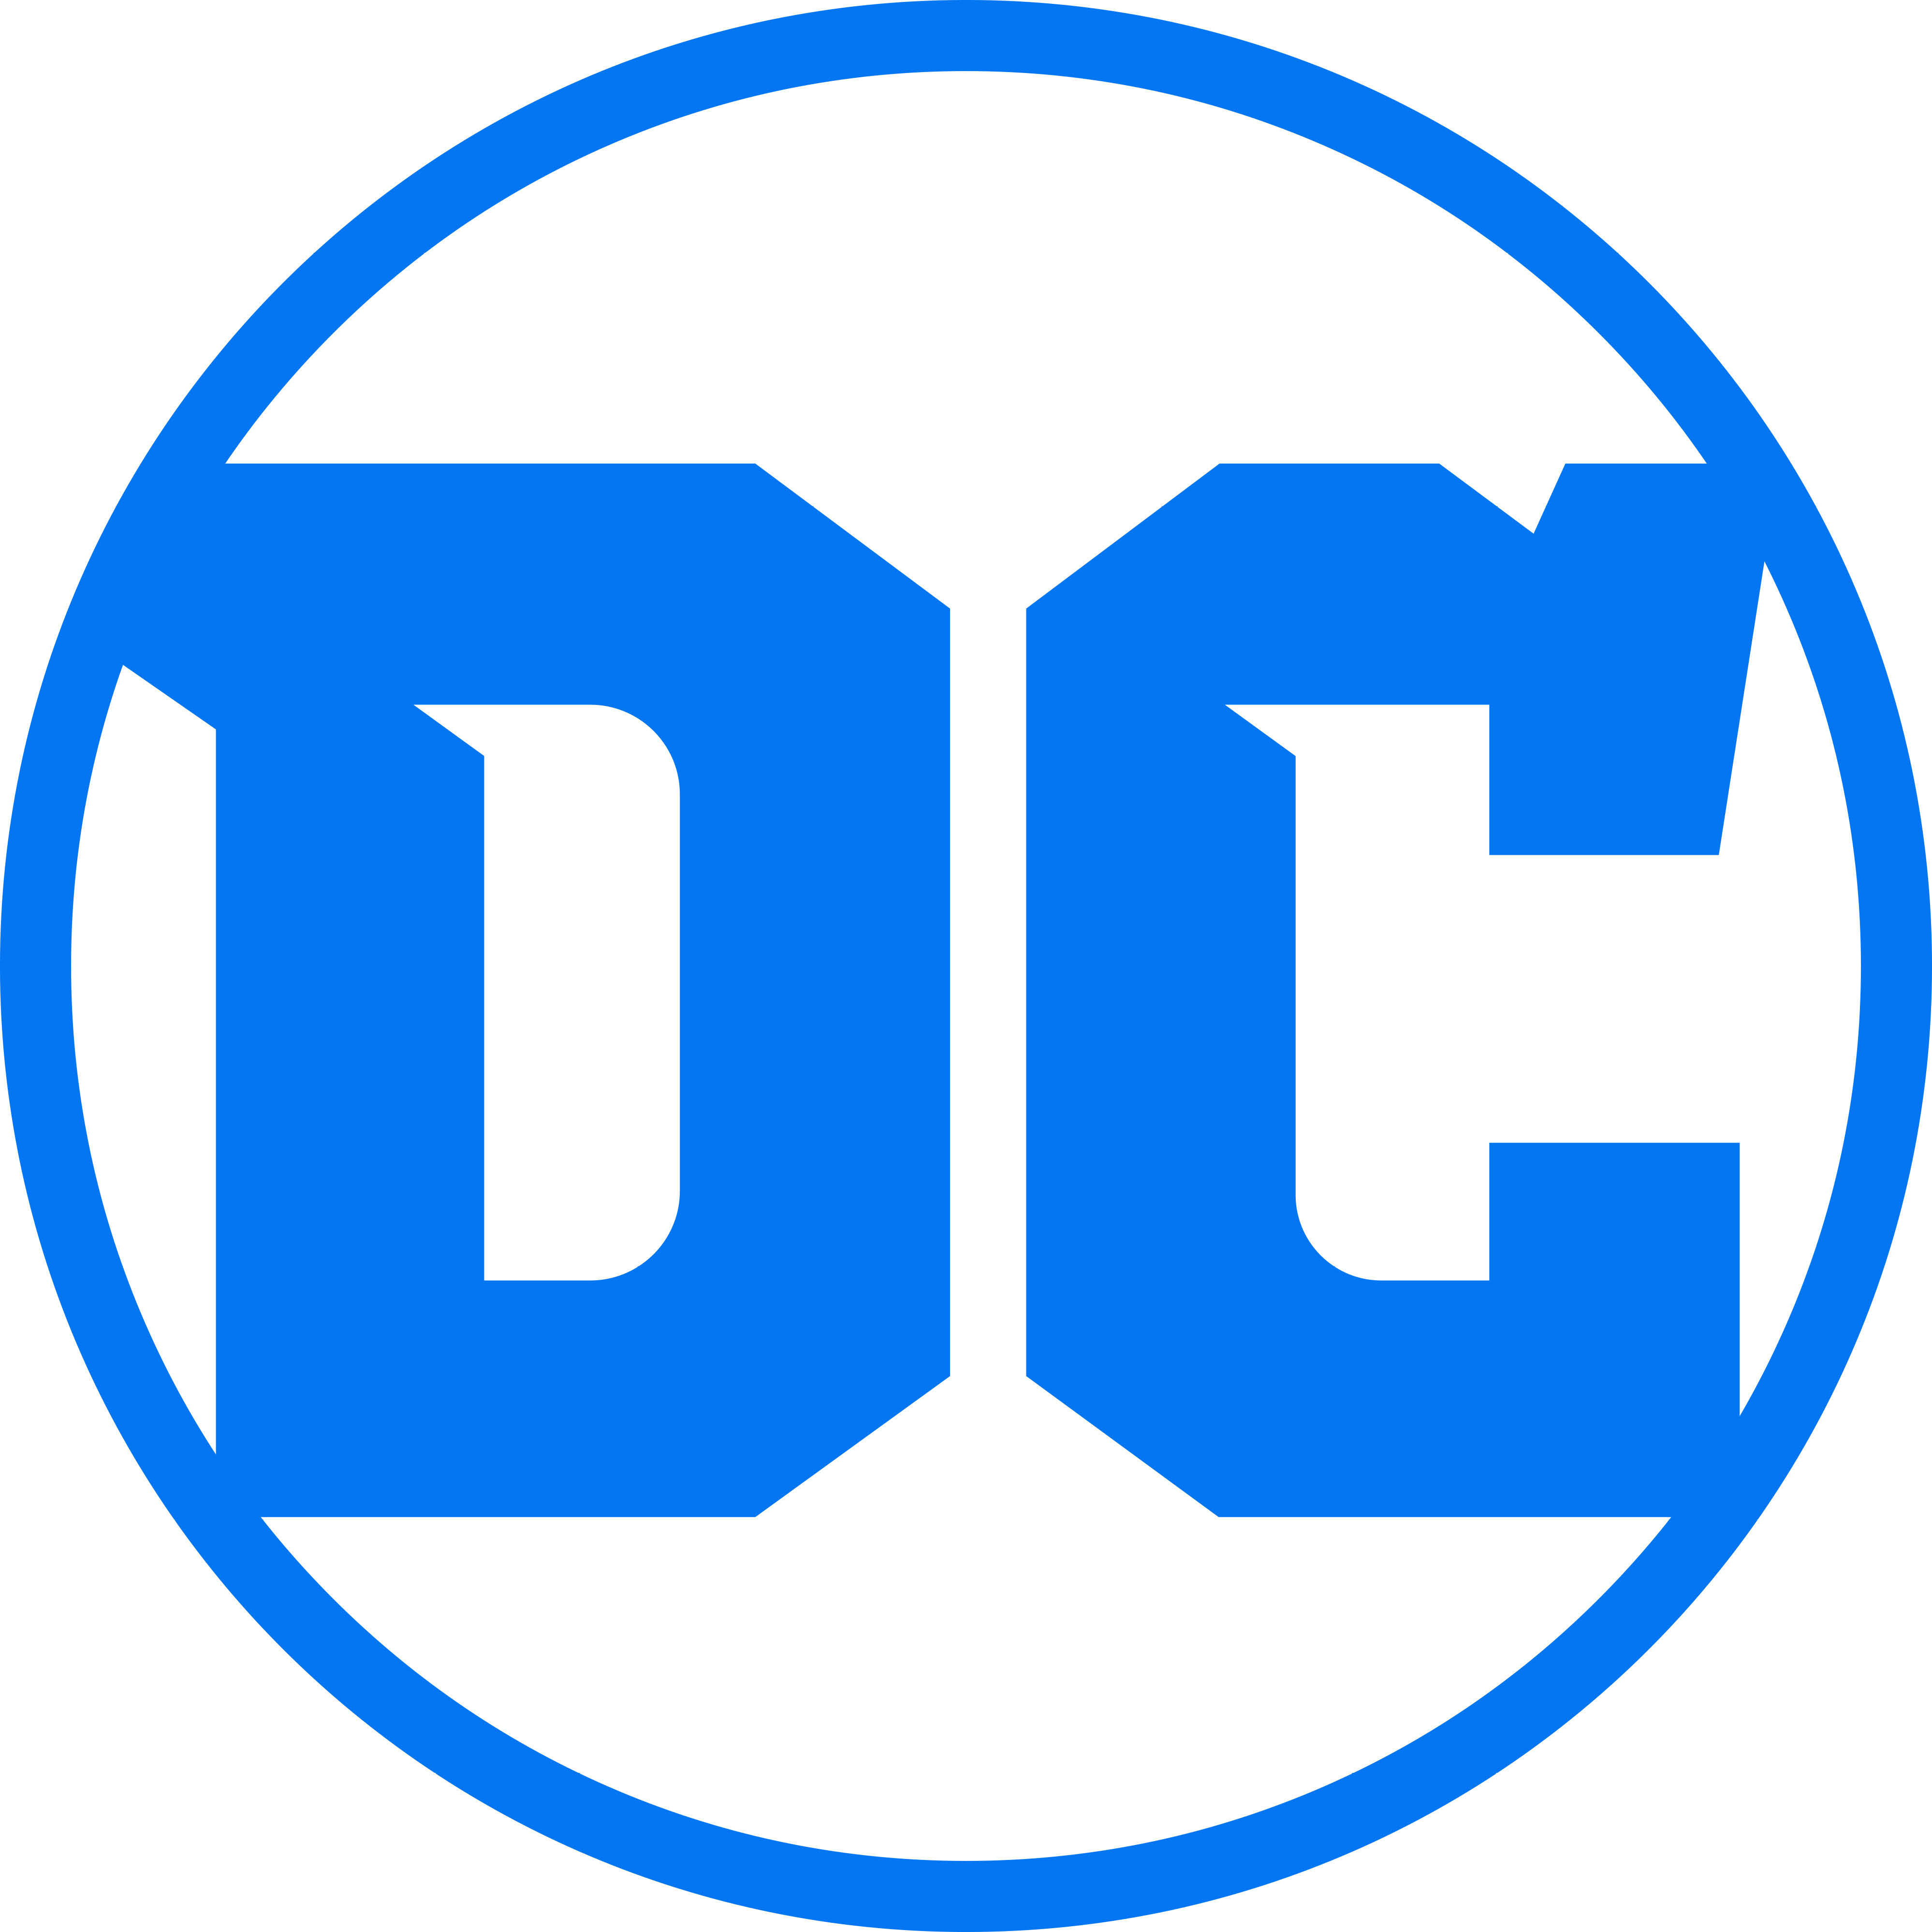 DC comics seans anime and comic book store toledo ohio comic book stores